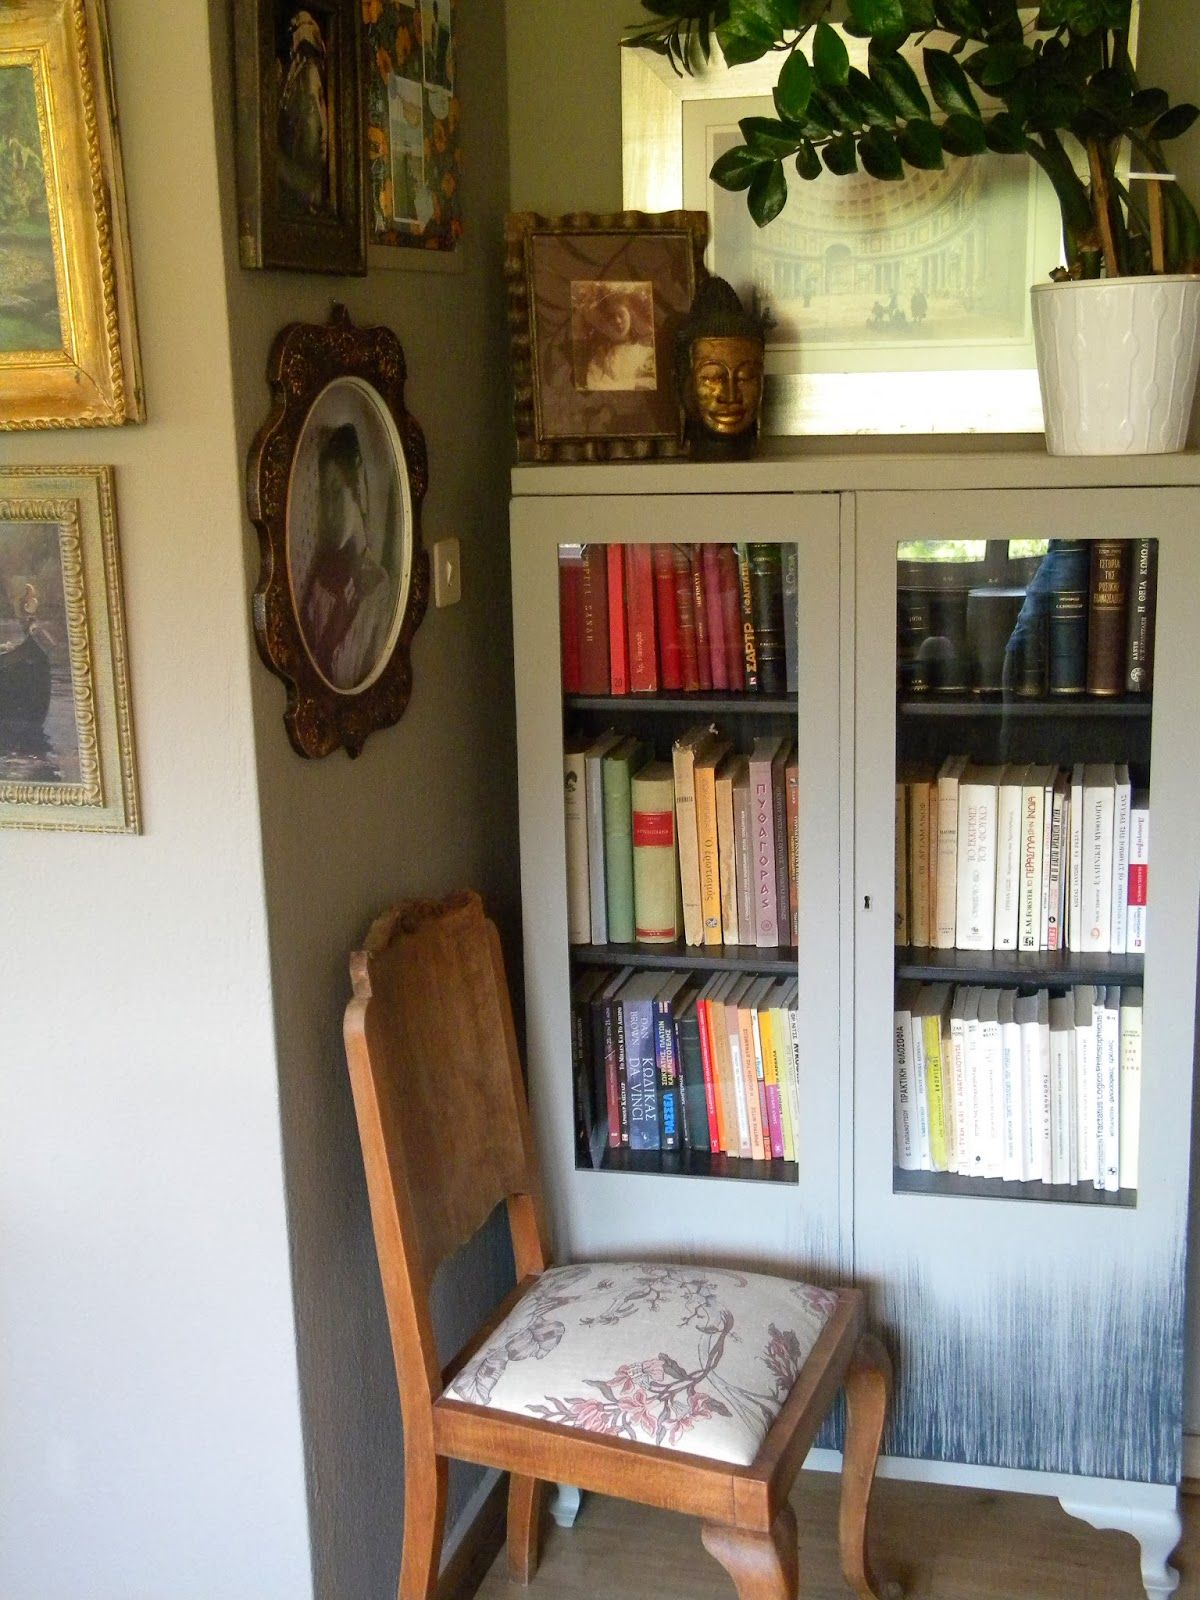 Stay Sunny Studio: A day at Ifigenia's Home και συνταγή χειροποίητης Chalk-y Paint